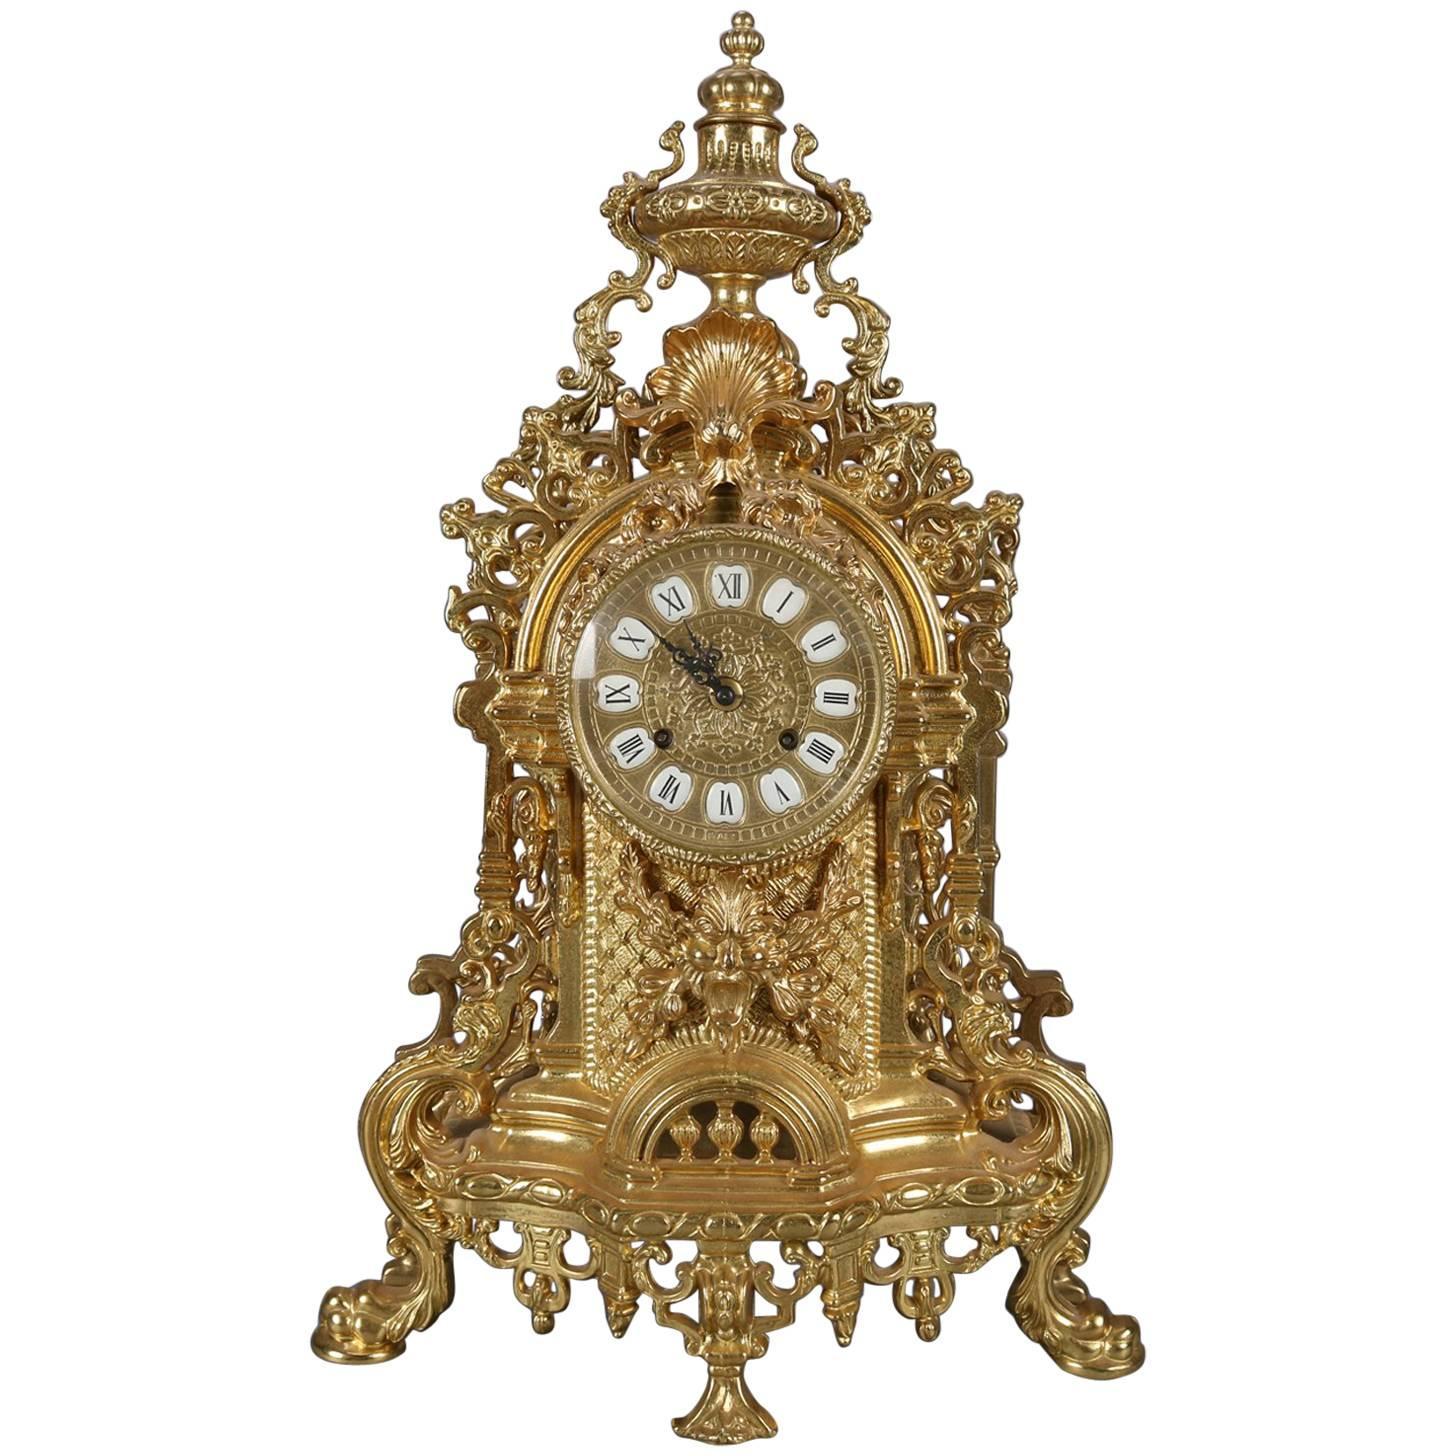 German made mantel clock